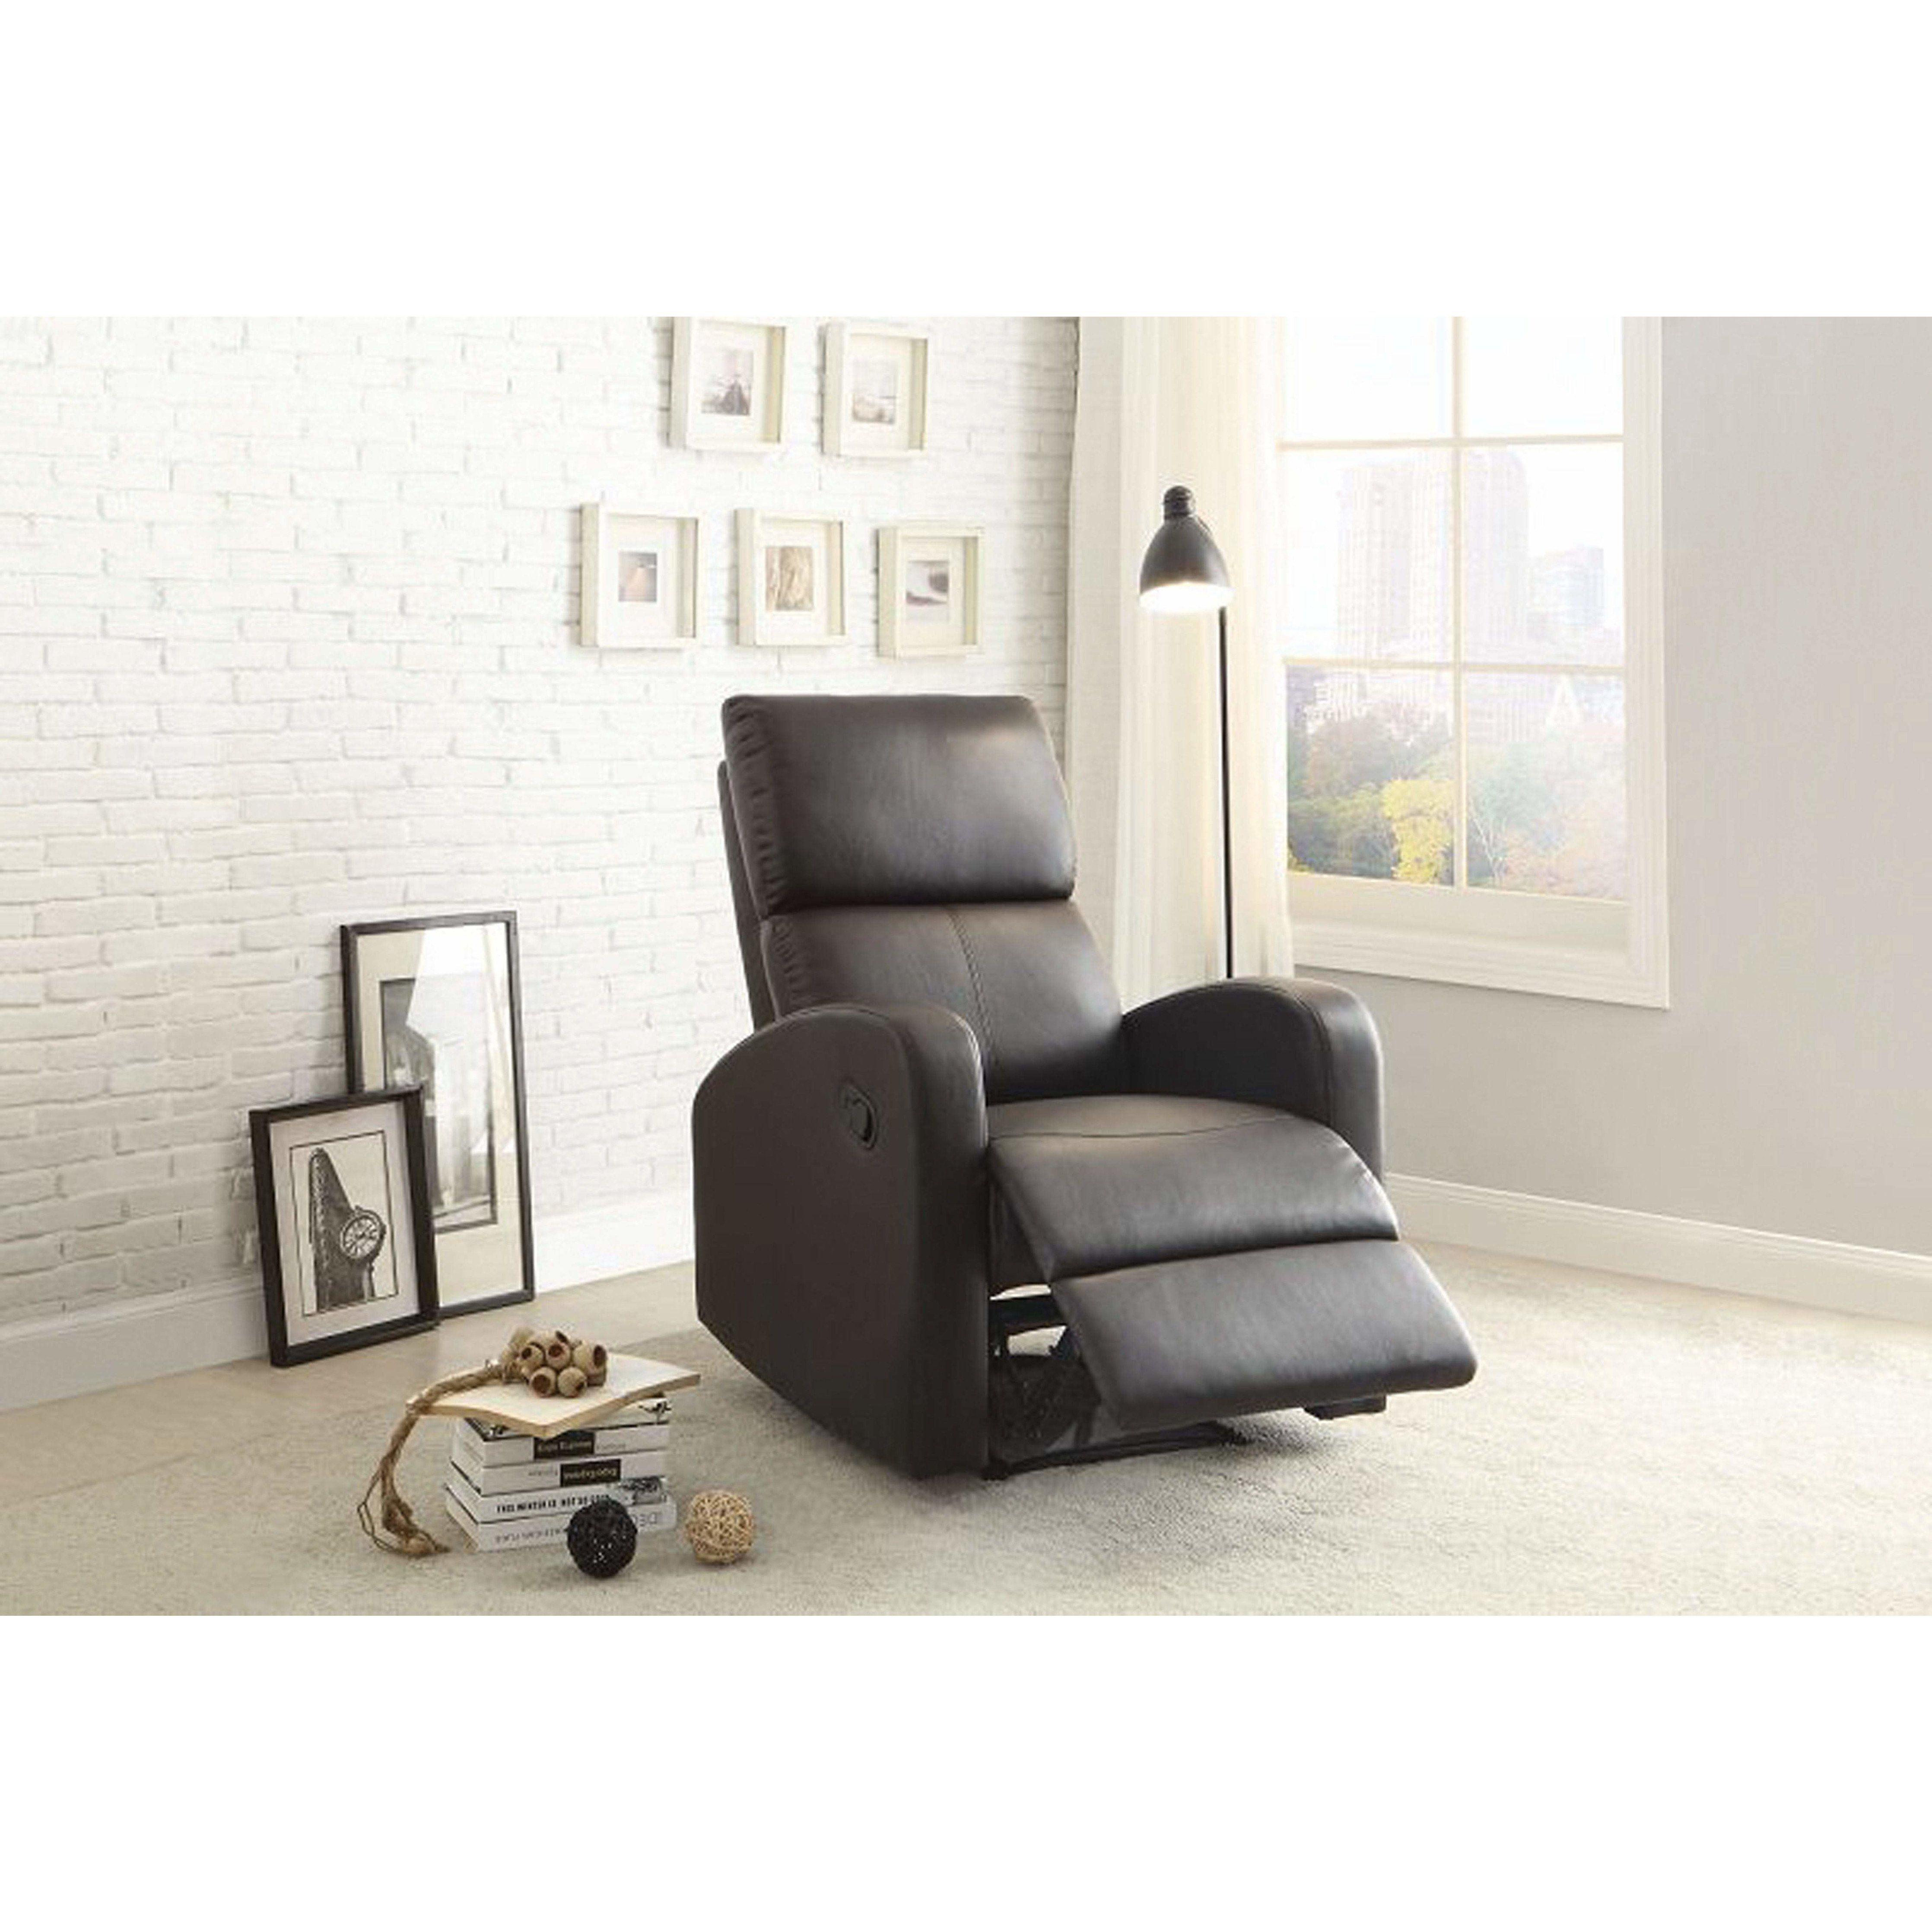 Mendon Recliner Recliner Chair Living Room Suite Recliner